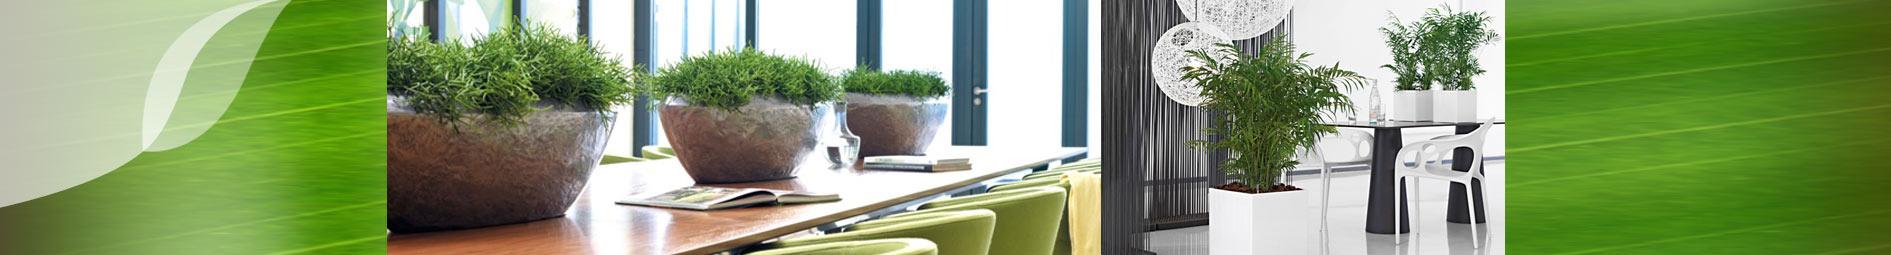 Hydrokultur gr n und raum raumbegr nung pflanzenpflege for Hydrokultur design